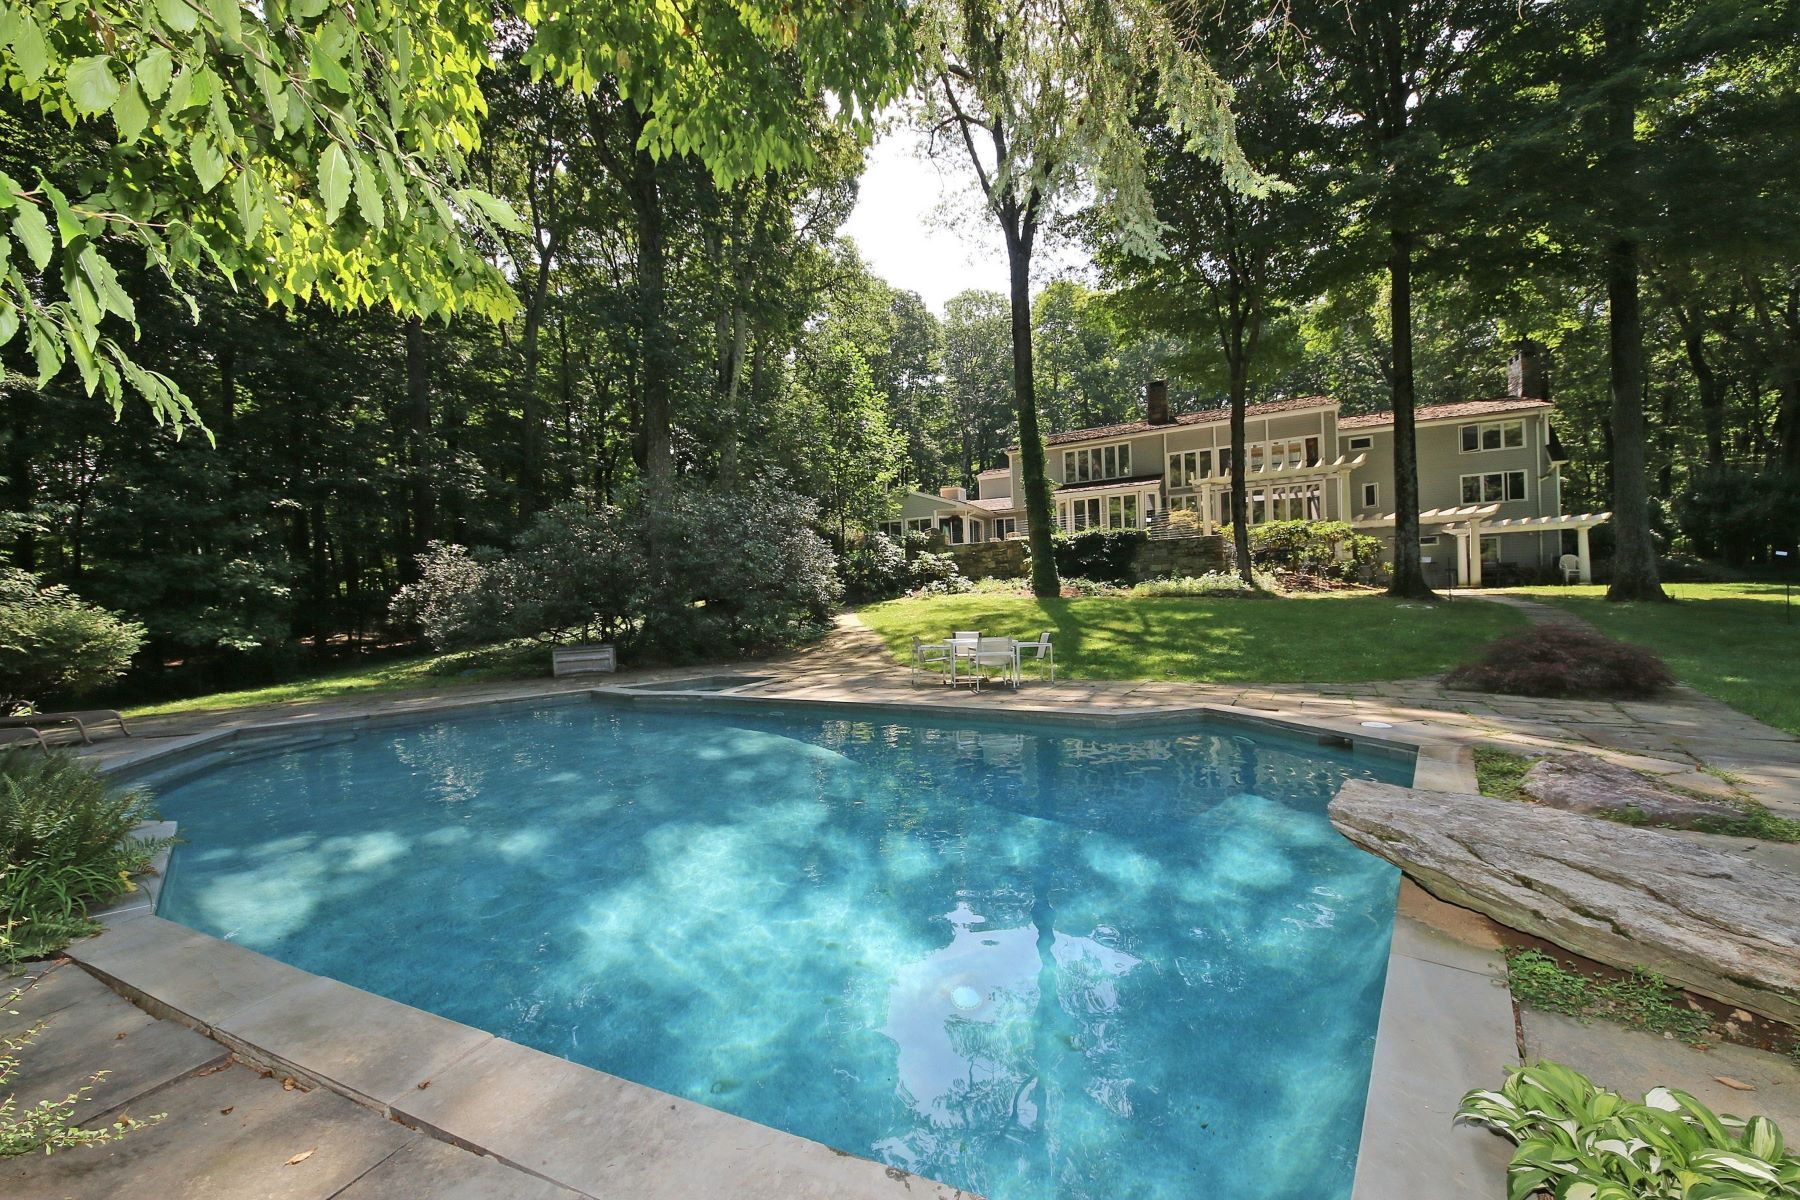 独户住宅 为 销售 在 Sensational Resort-like Home 99 Topstone Road 雷丁, 康涅狄格州 06896 美国